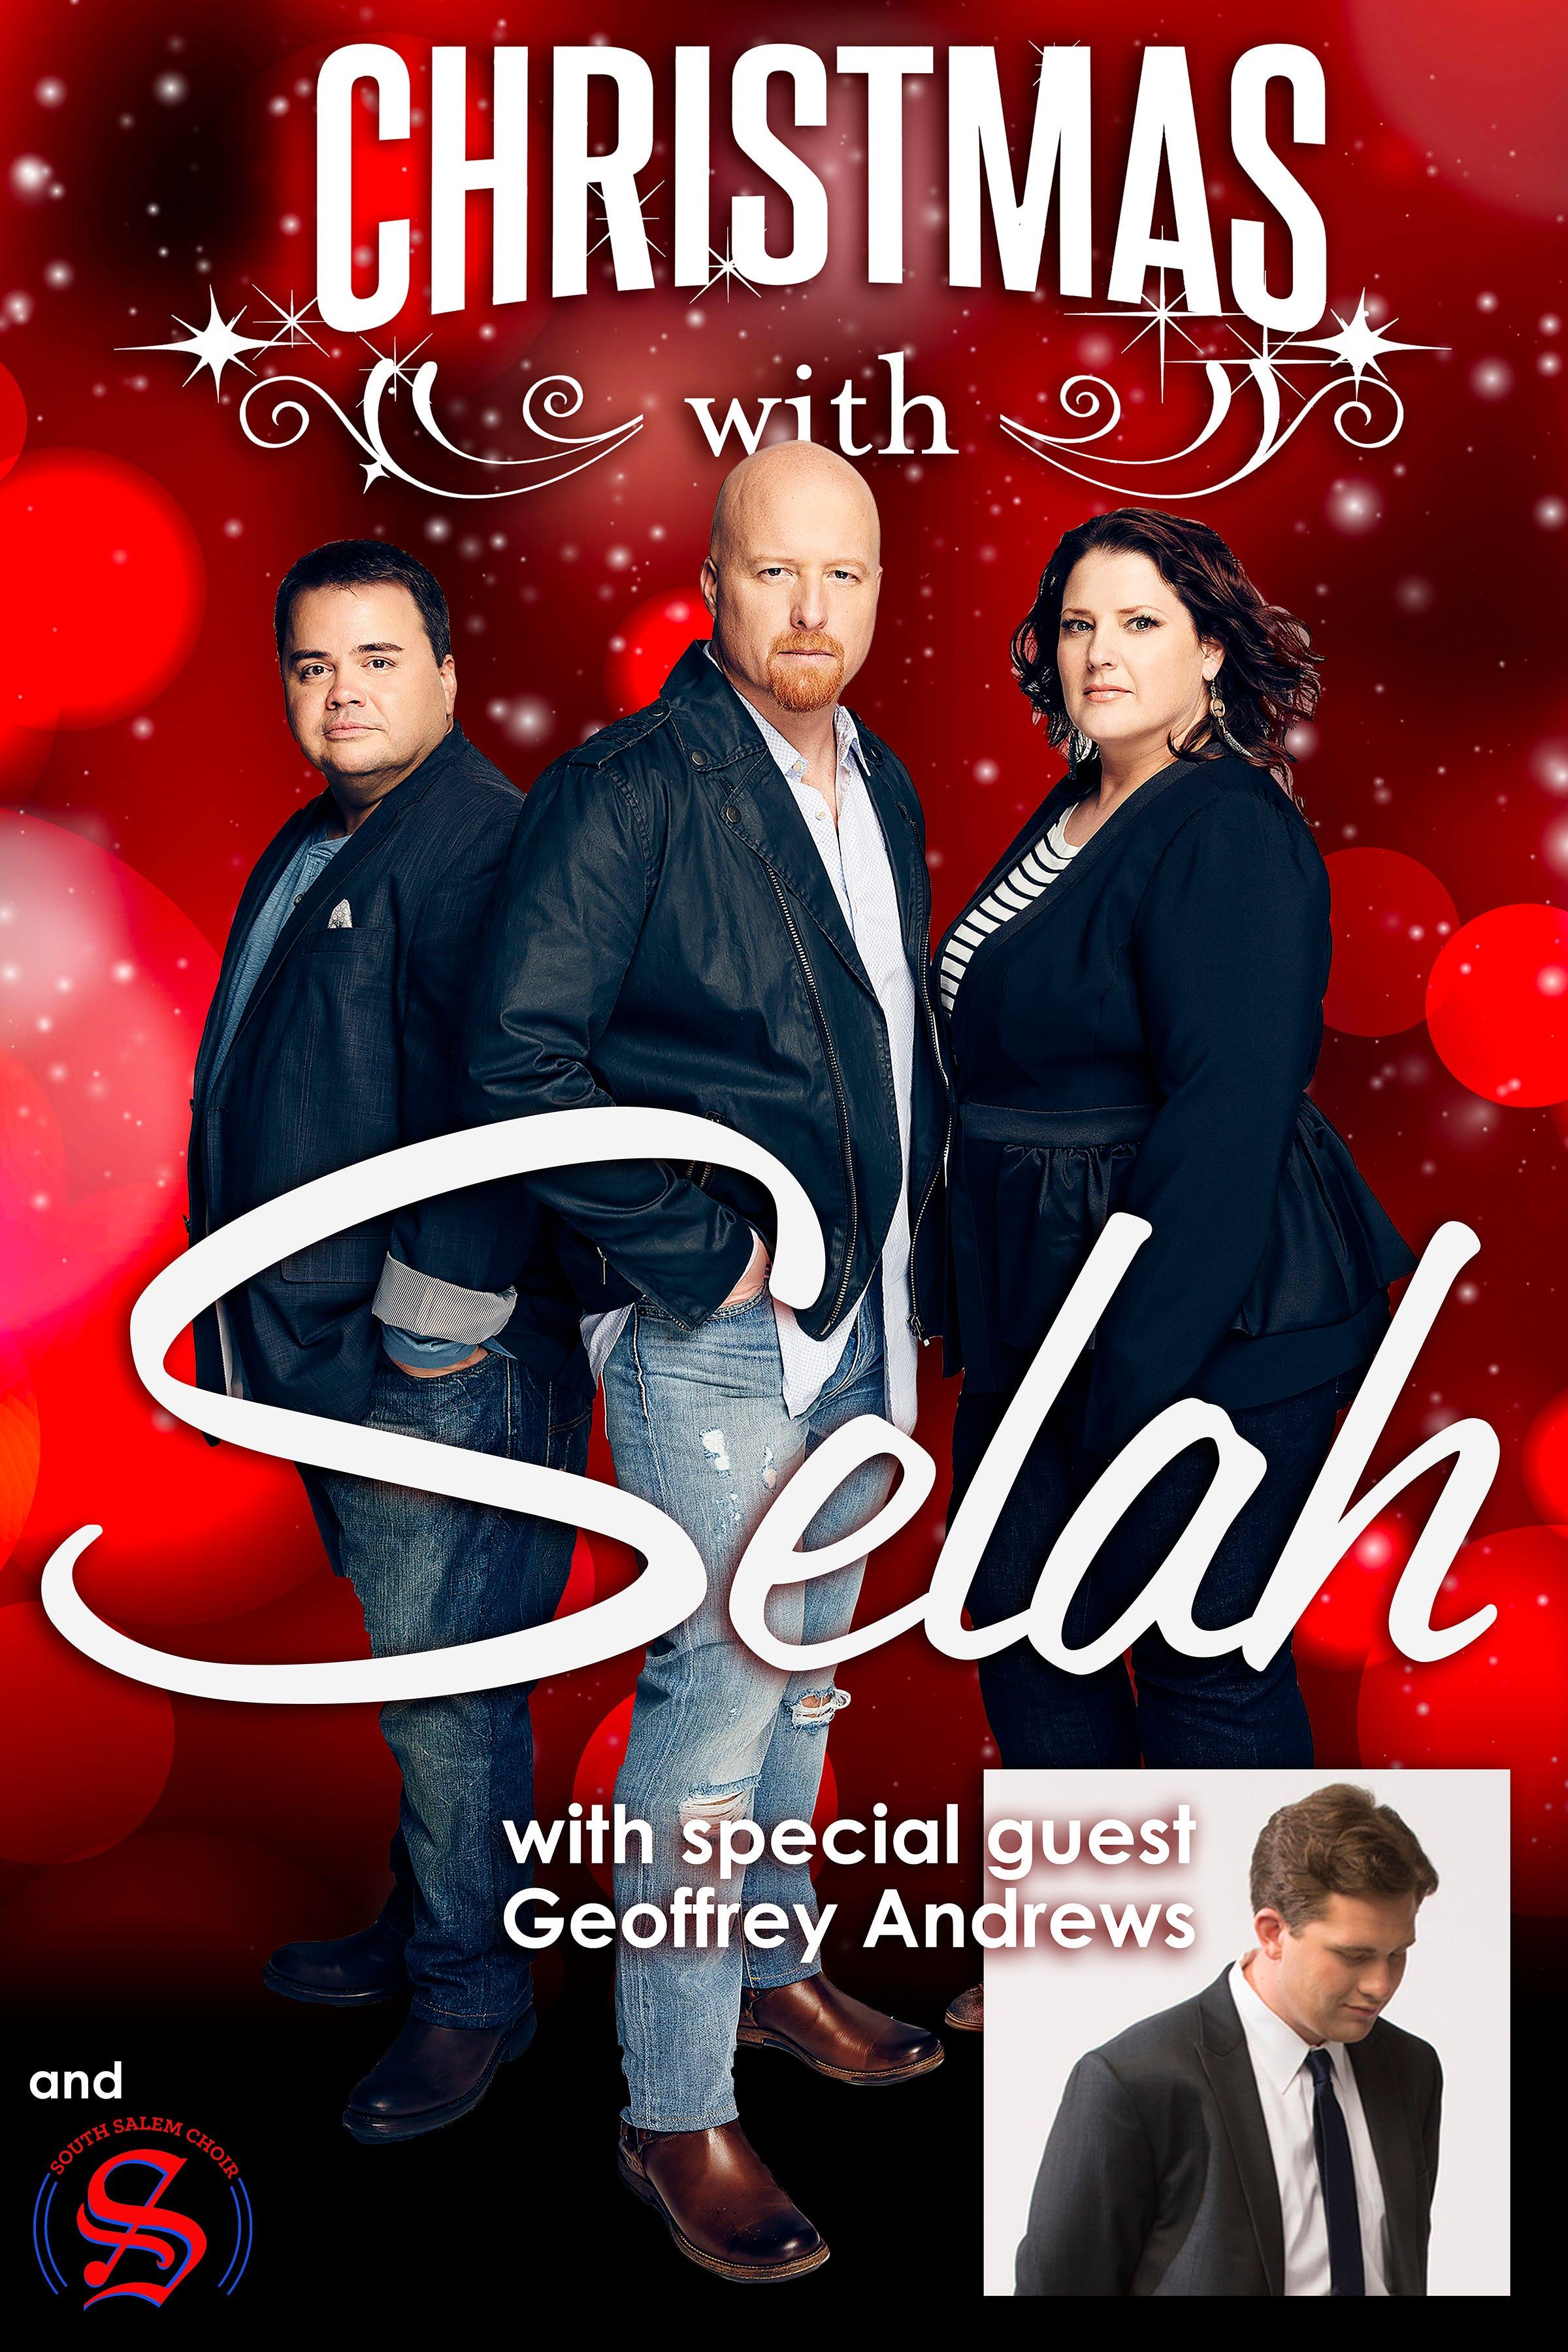 Selah Christmas 2020 Salem Oregon Salem November events: Haunted houses, holiday bazaars, art fairs